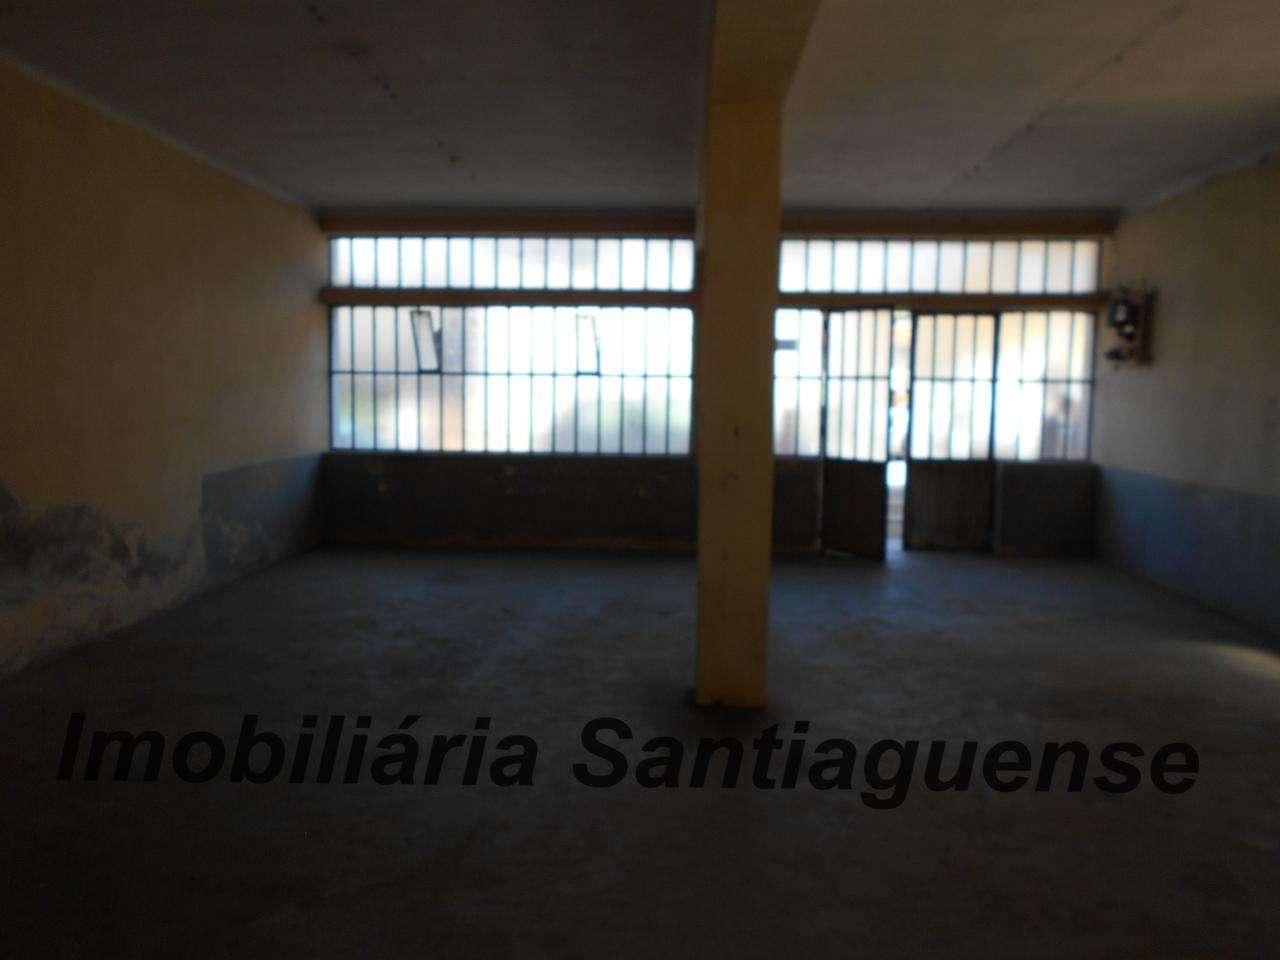 Loja para arrendar, Oliveira de Azeméis, Santiago de Riba-Ul, Ul, Macinhata da Seixa e Madail, Oliveira de Azeméis, Aveiro - Foto 4